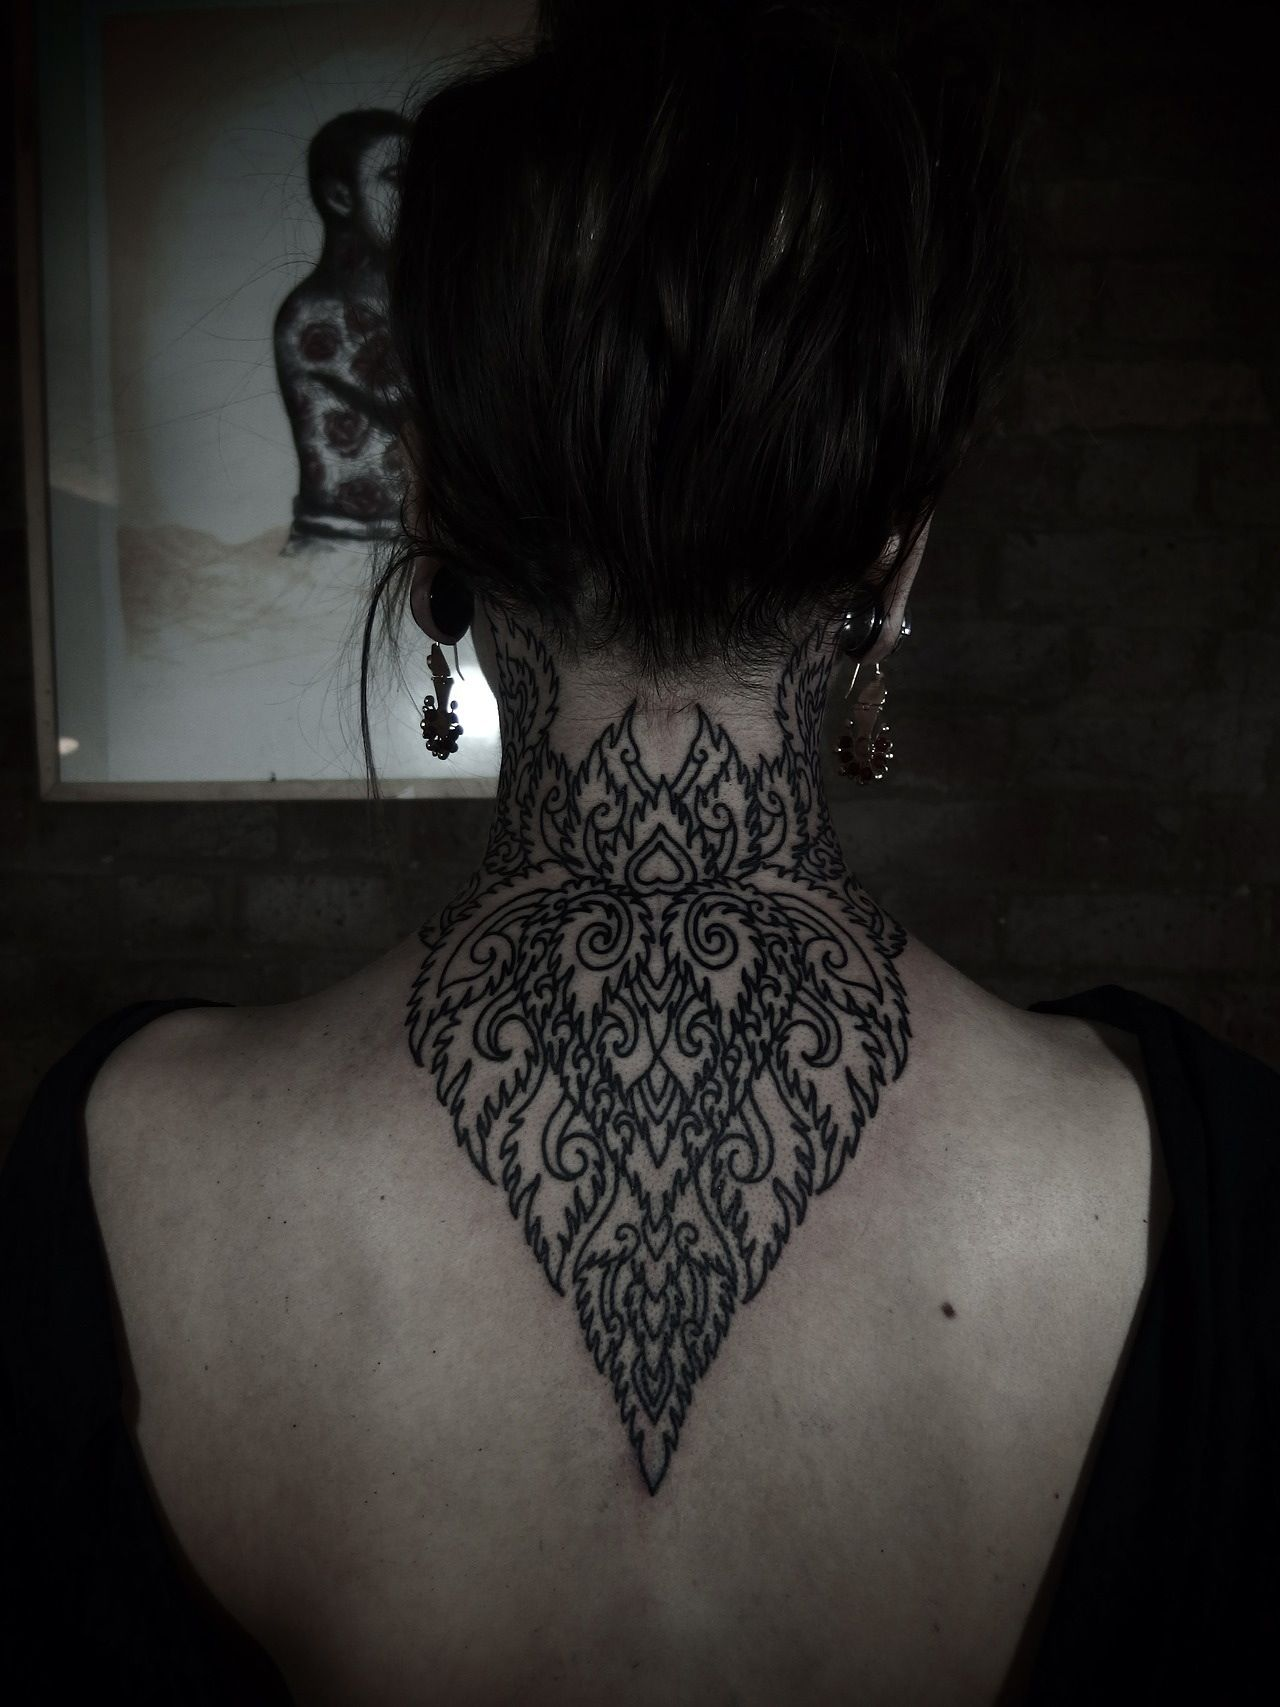 3d tattoos that will boggle your mind bizarbin - 17 B Sta Bilder Om Tattoos P Pinterest Emily Rose Tatueringsid Er Och Tatuerare